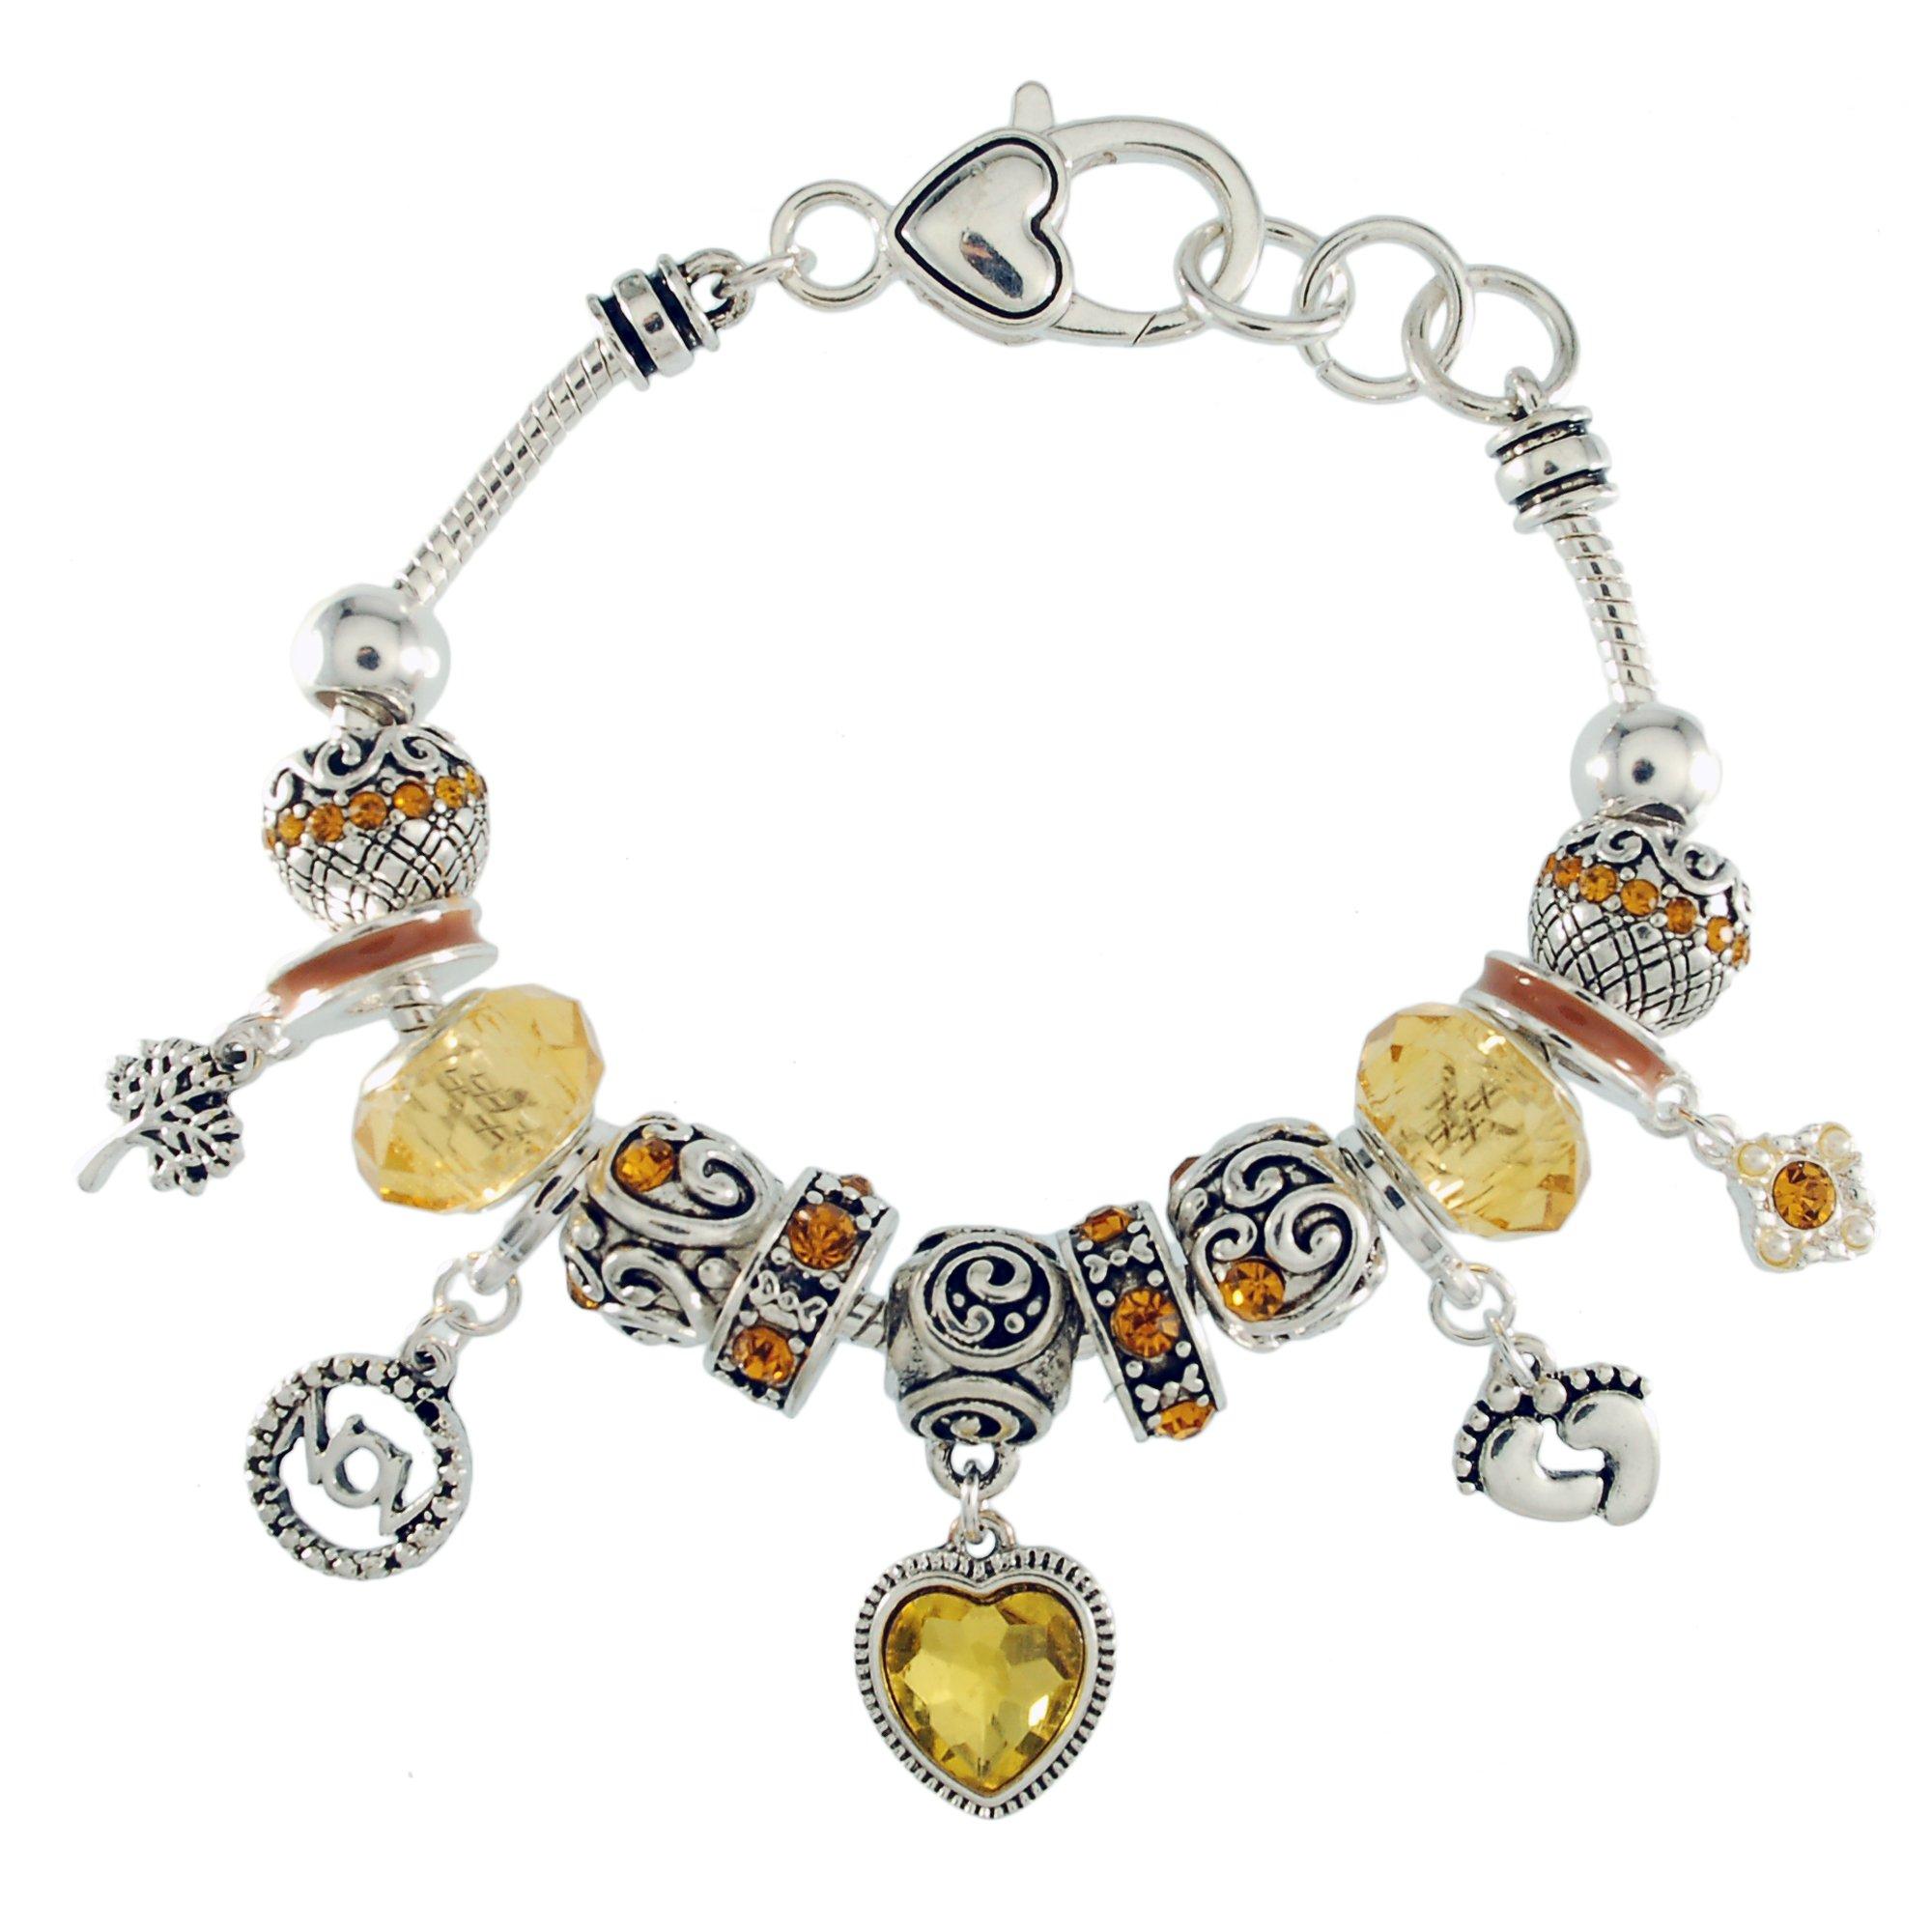 Landau Ambrosia November Birthstone Charm Bracelet